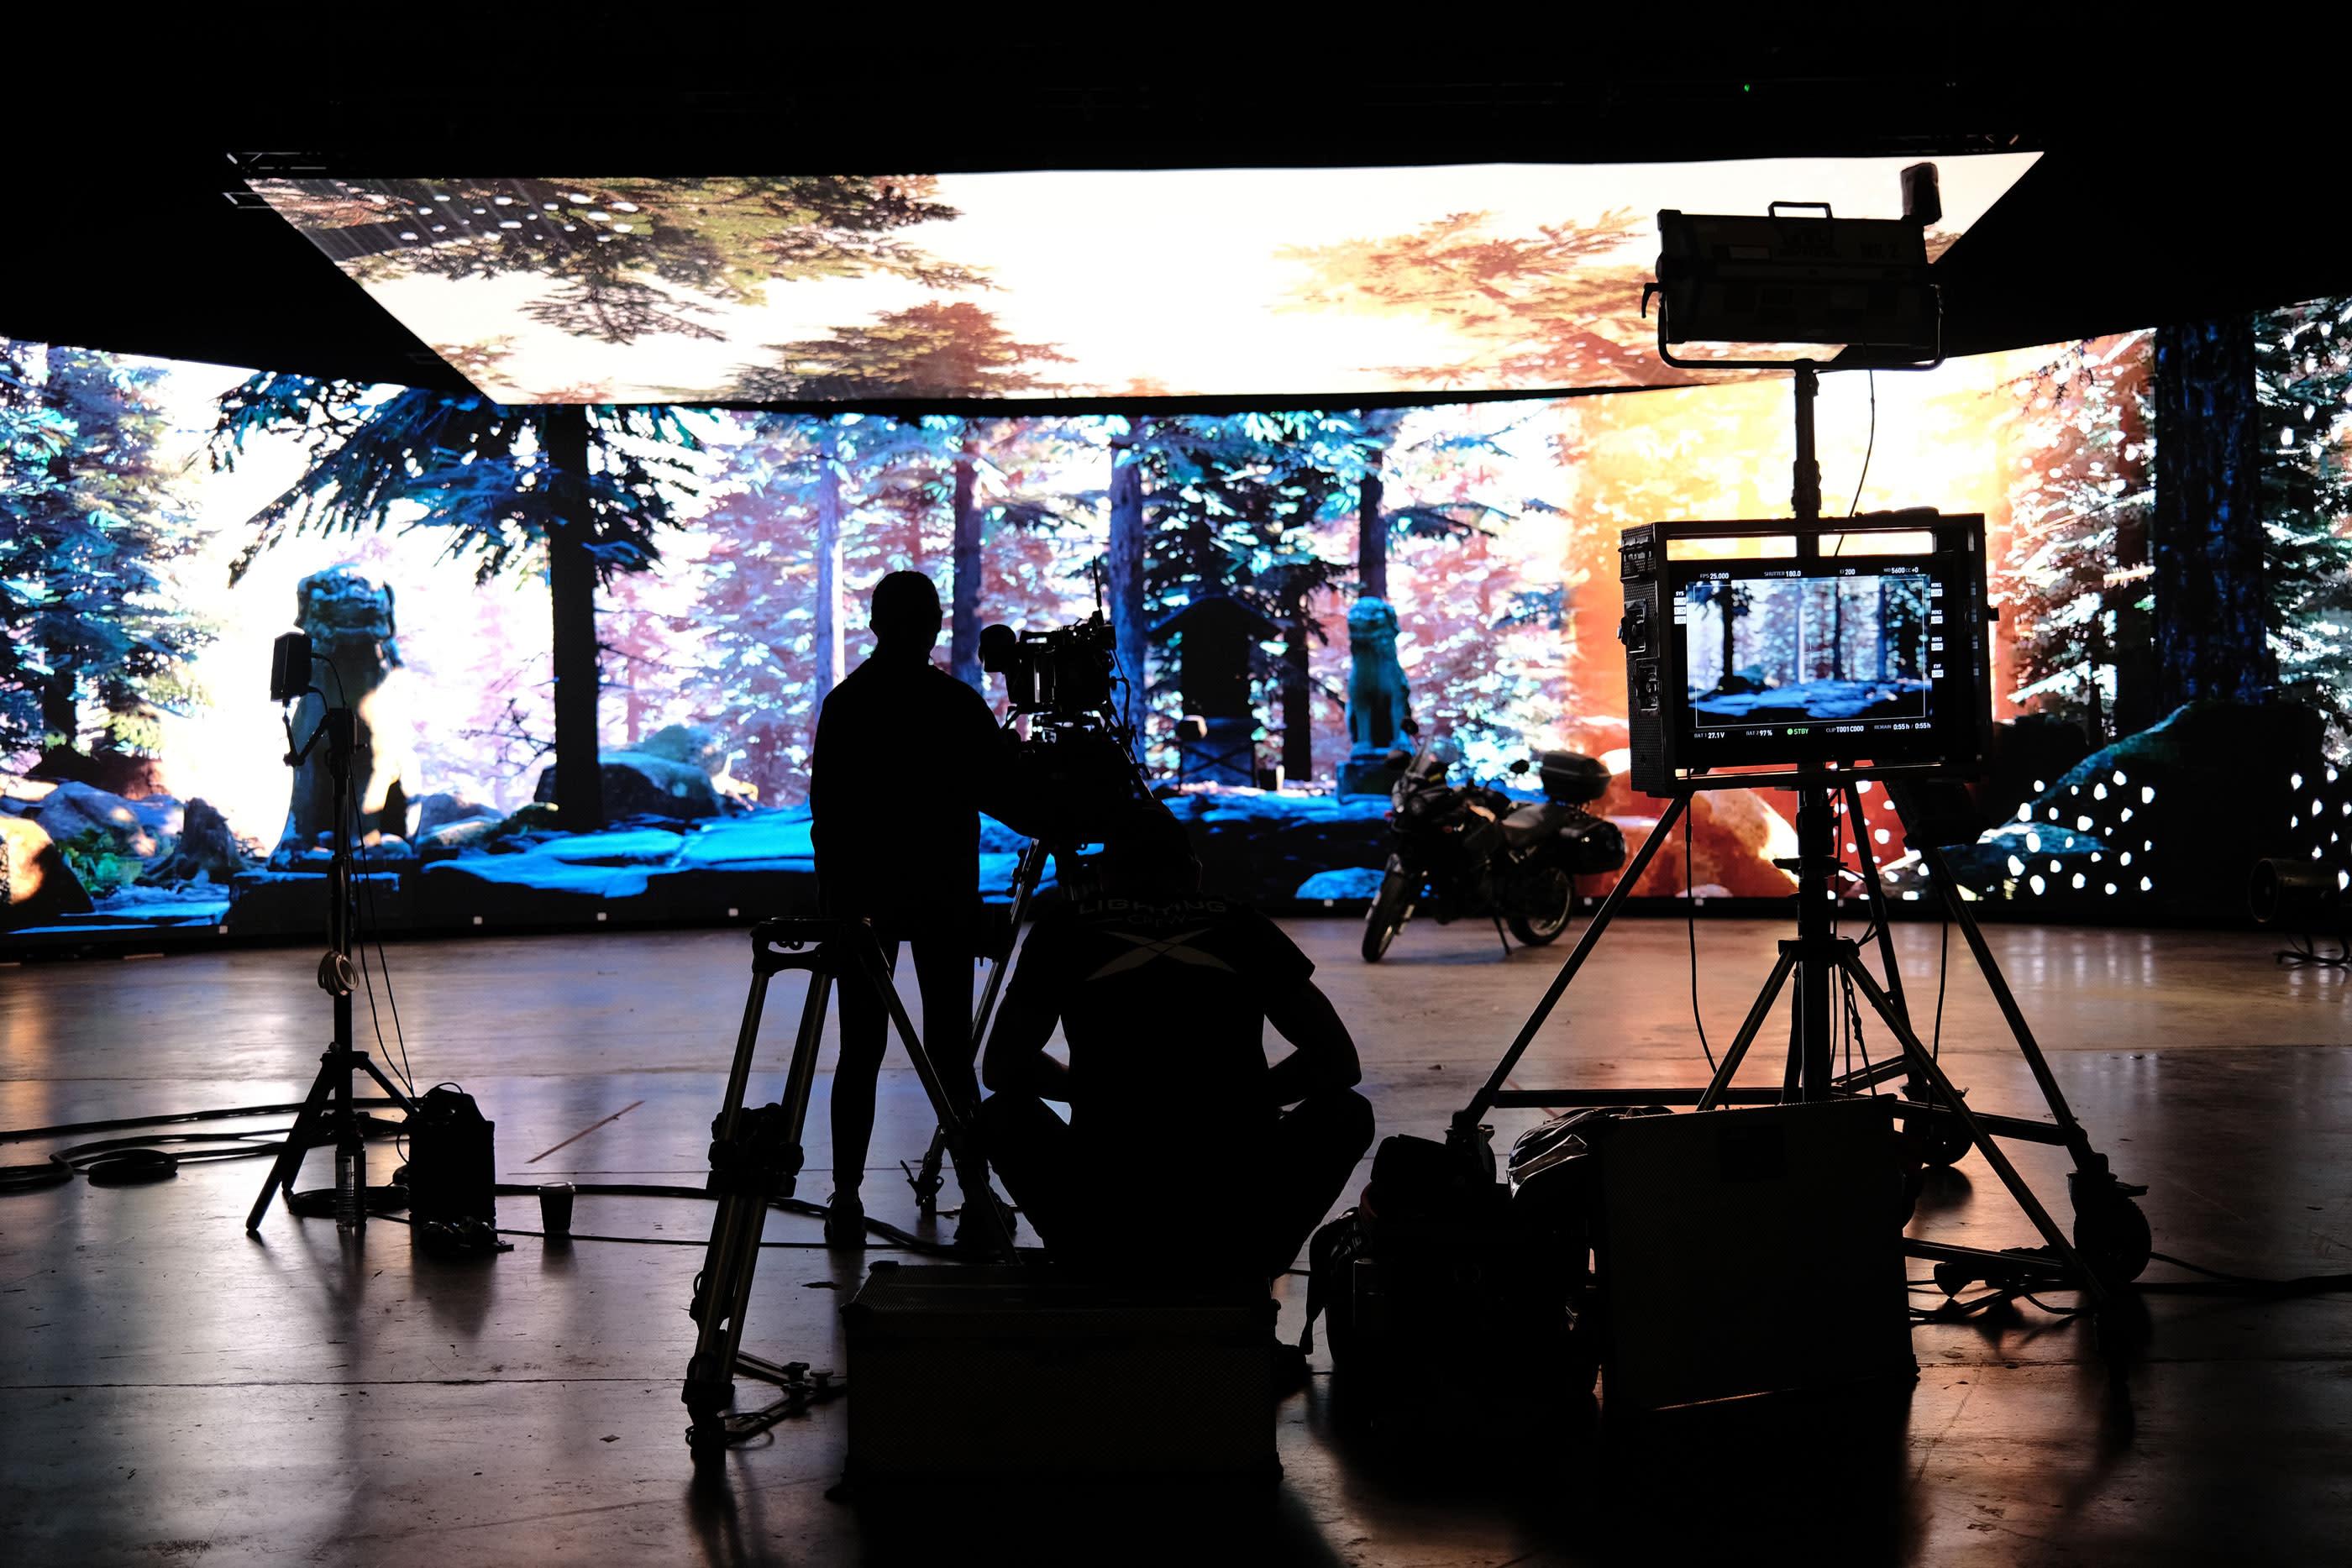 Shooting inside LED wall volume